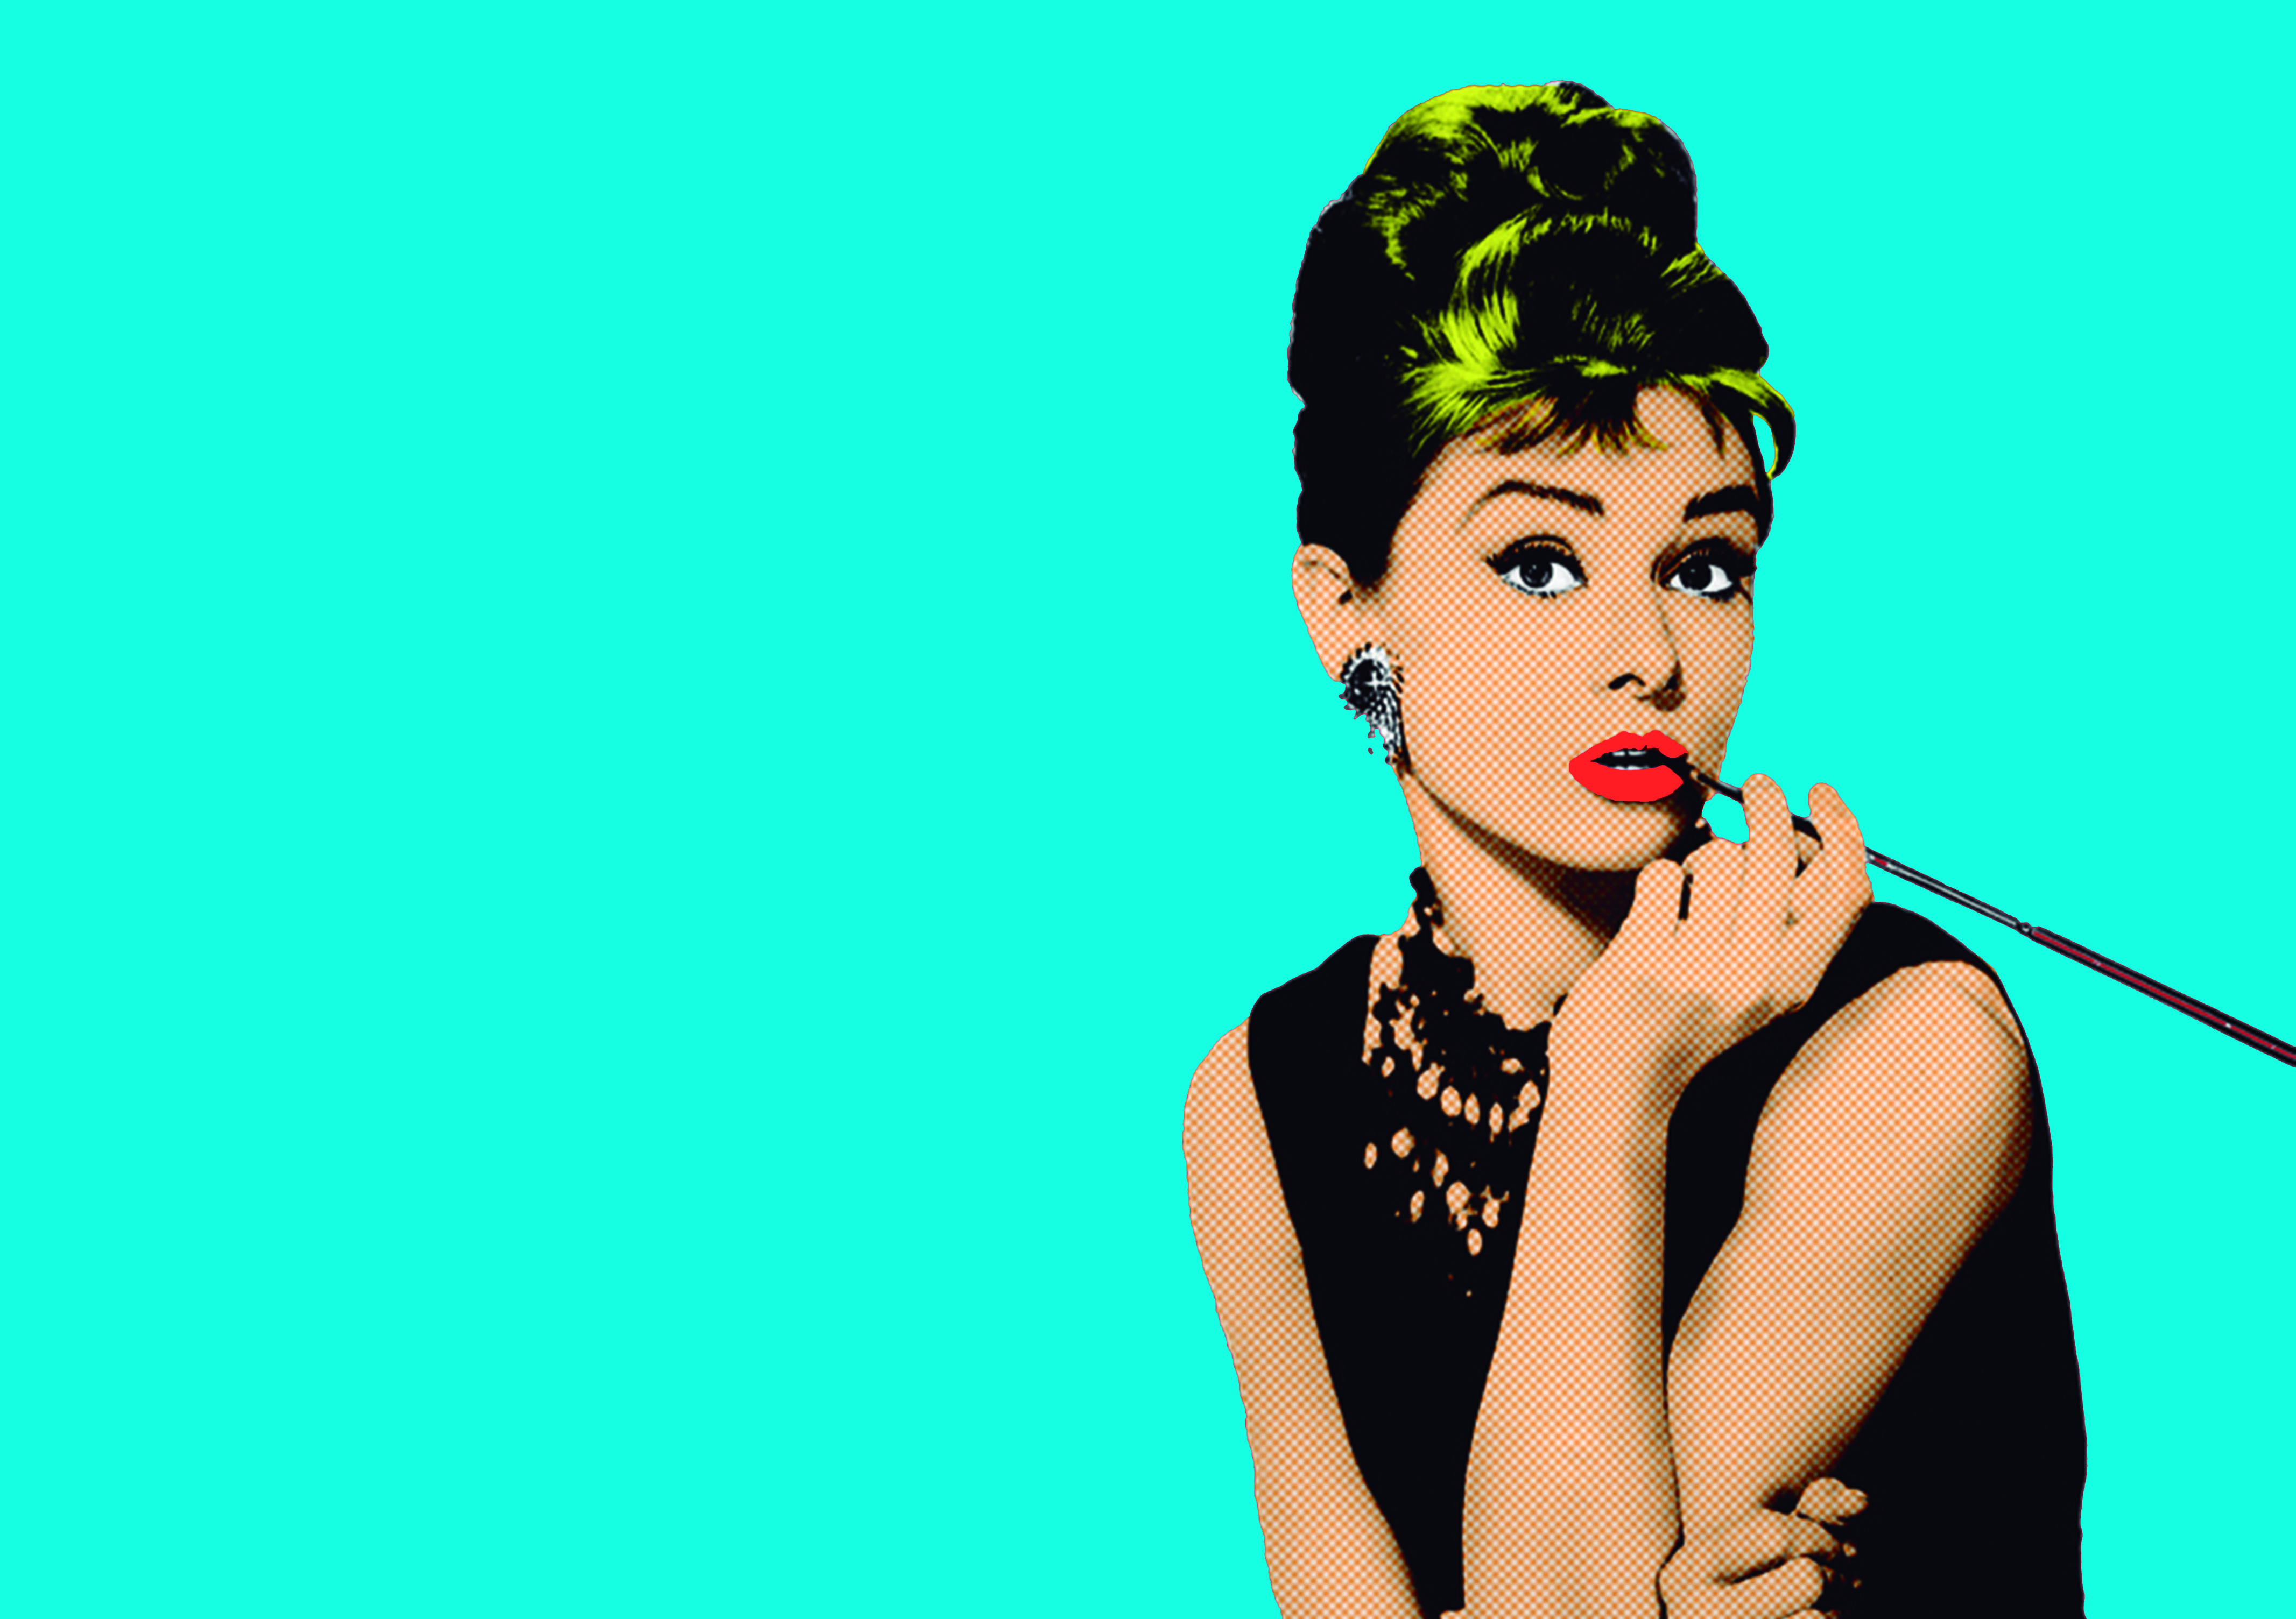 Audrey Hepburn. Pop Art. Tiffanys Breakfast | ᴄ ʀ ɪ ᴀ ᴛ ɪ ᴠ ᴇ s ...